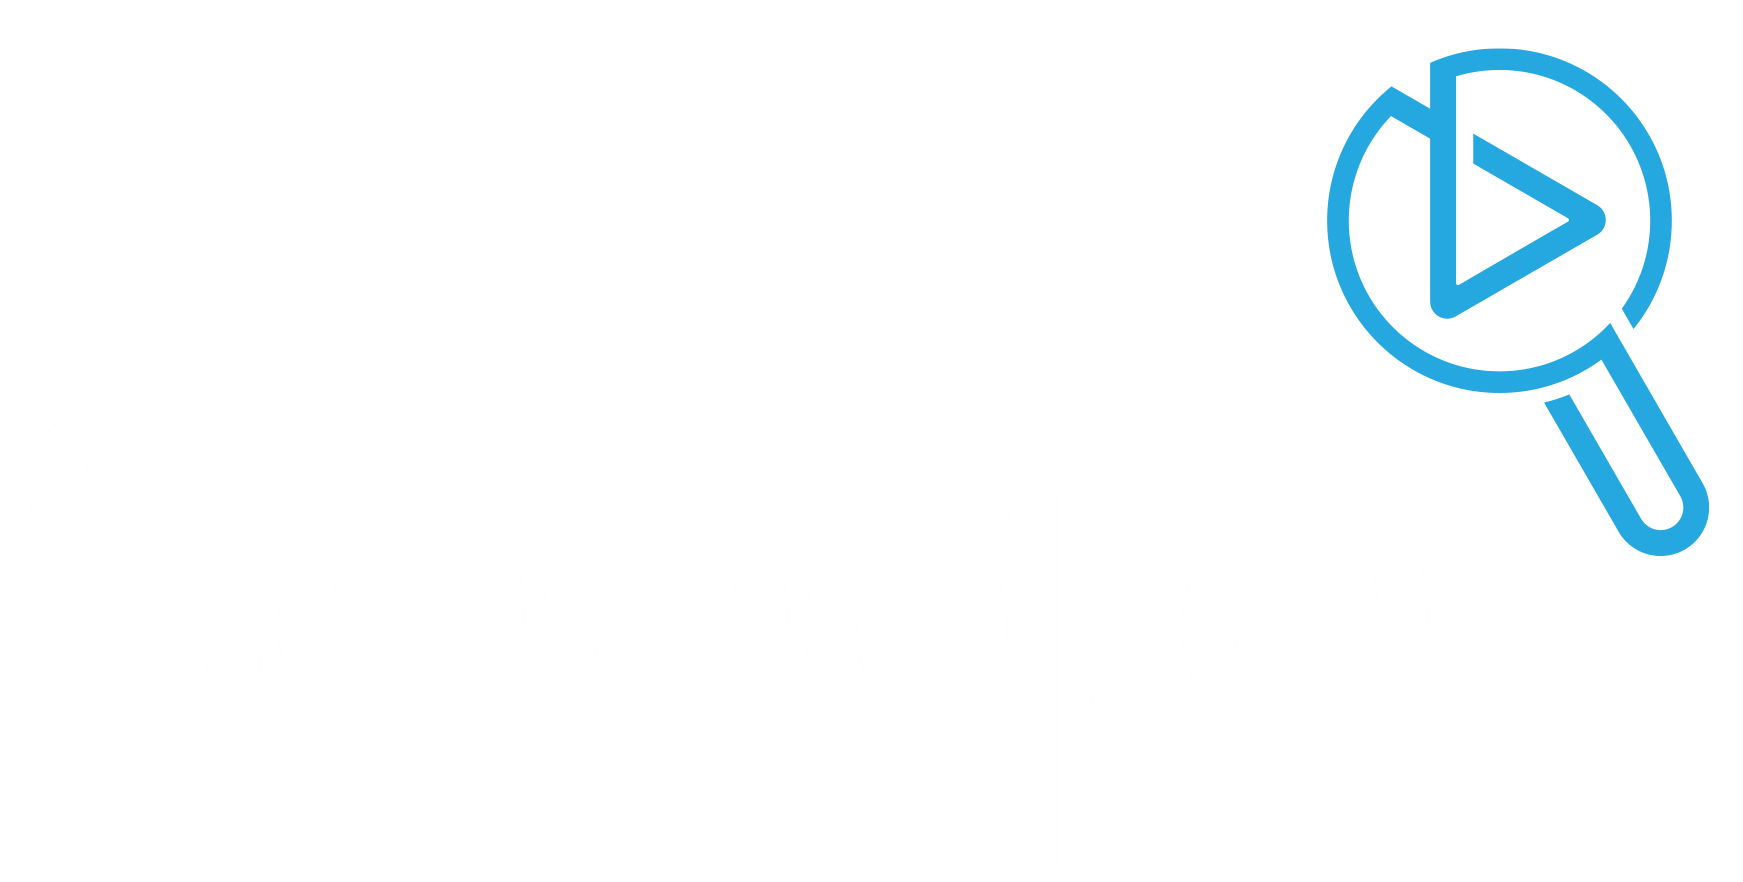 Seeqle